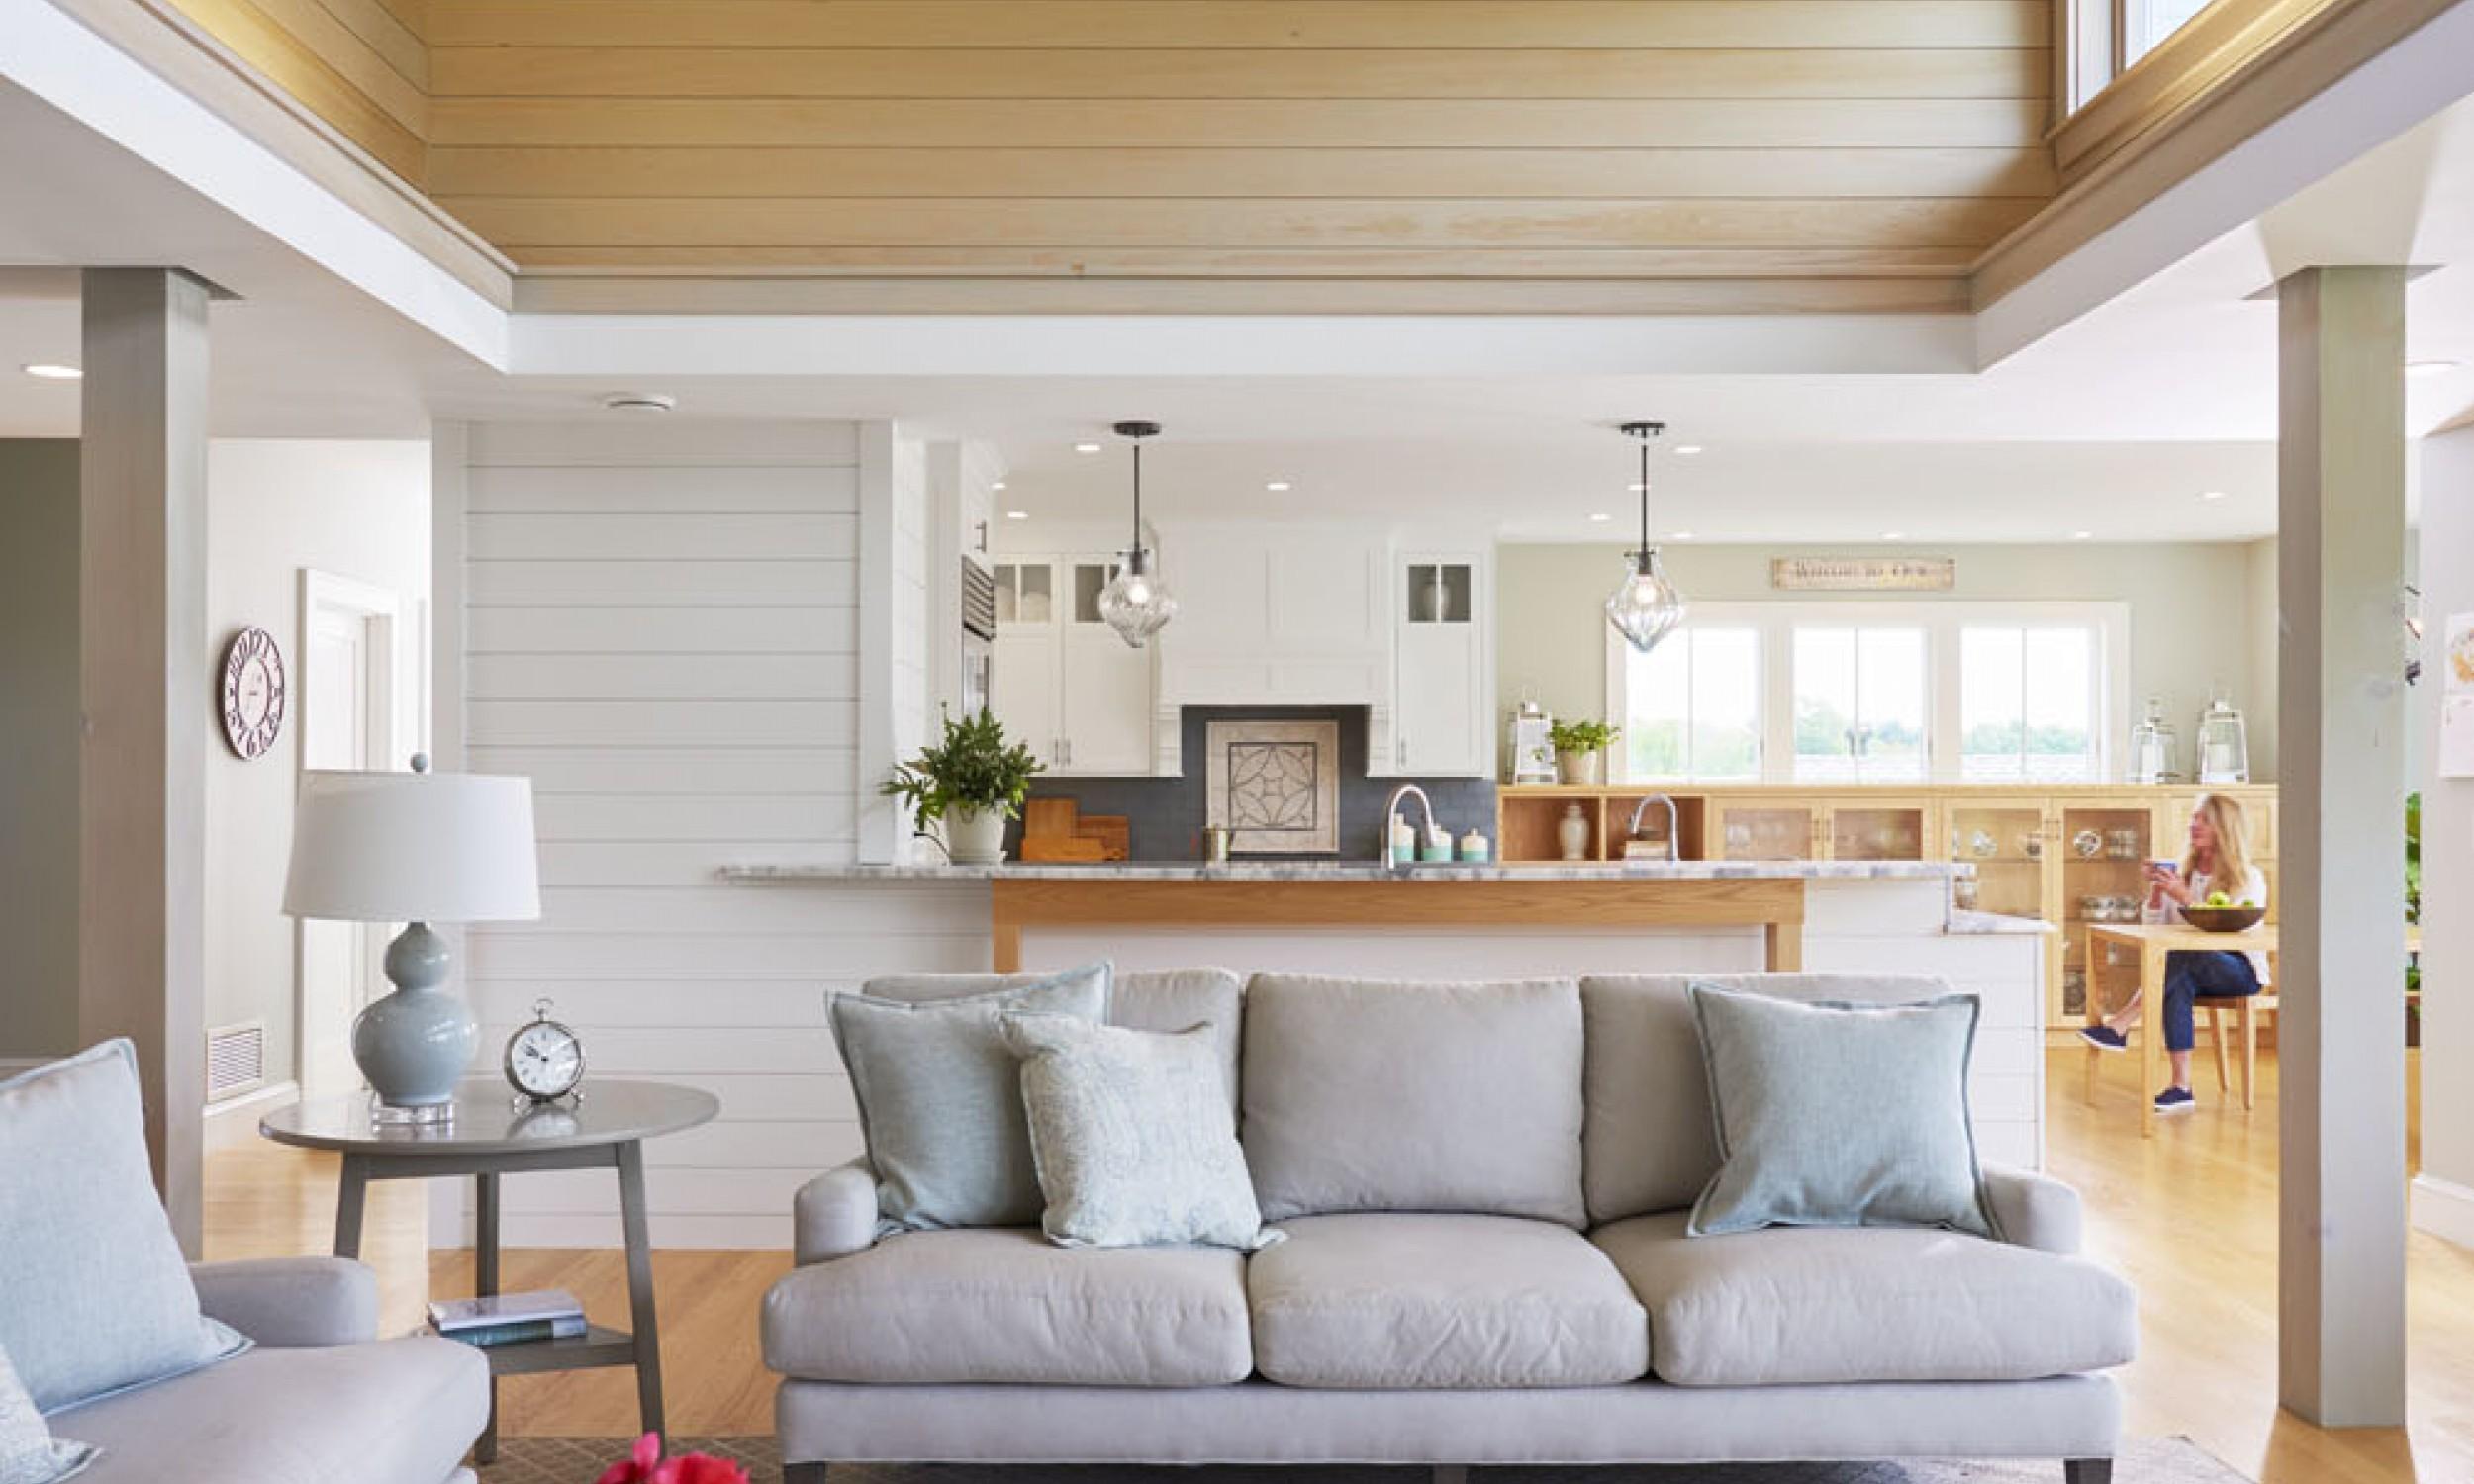 Living Room, wood ceiling, high windows, Maine Architect